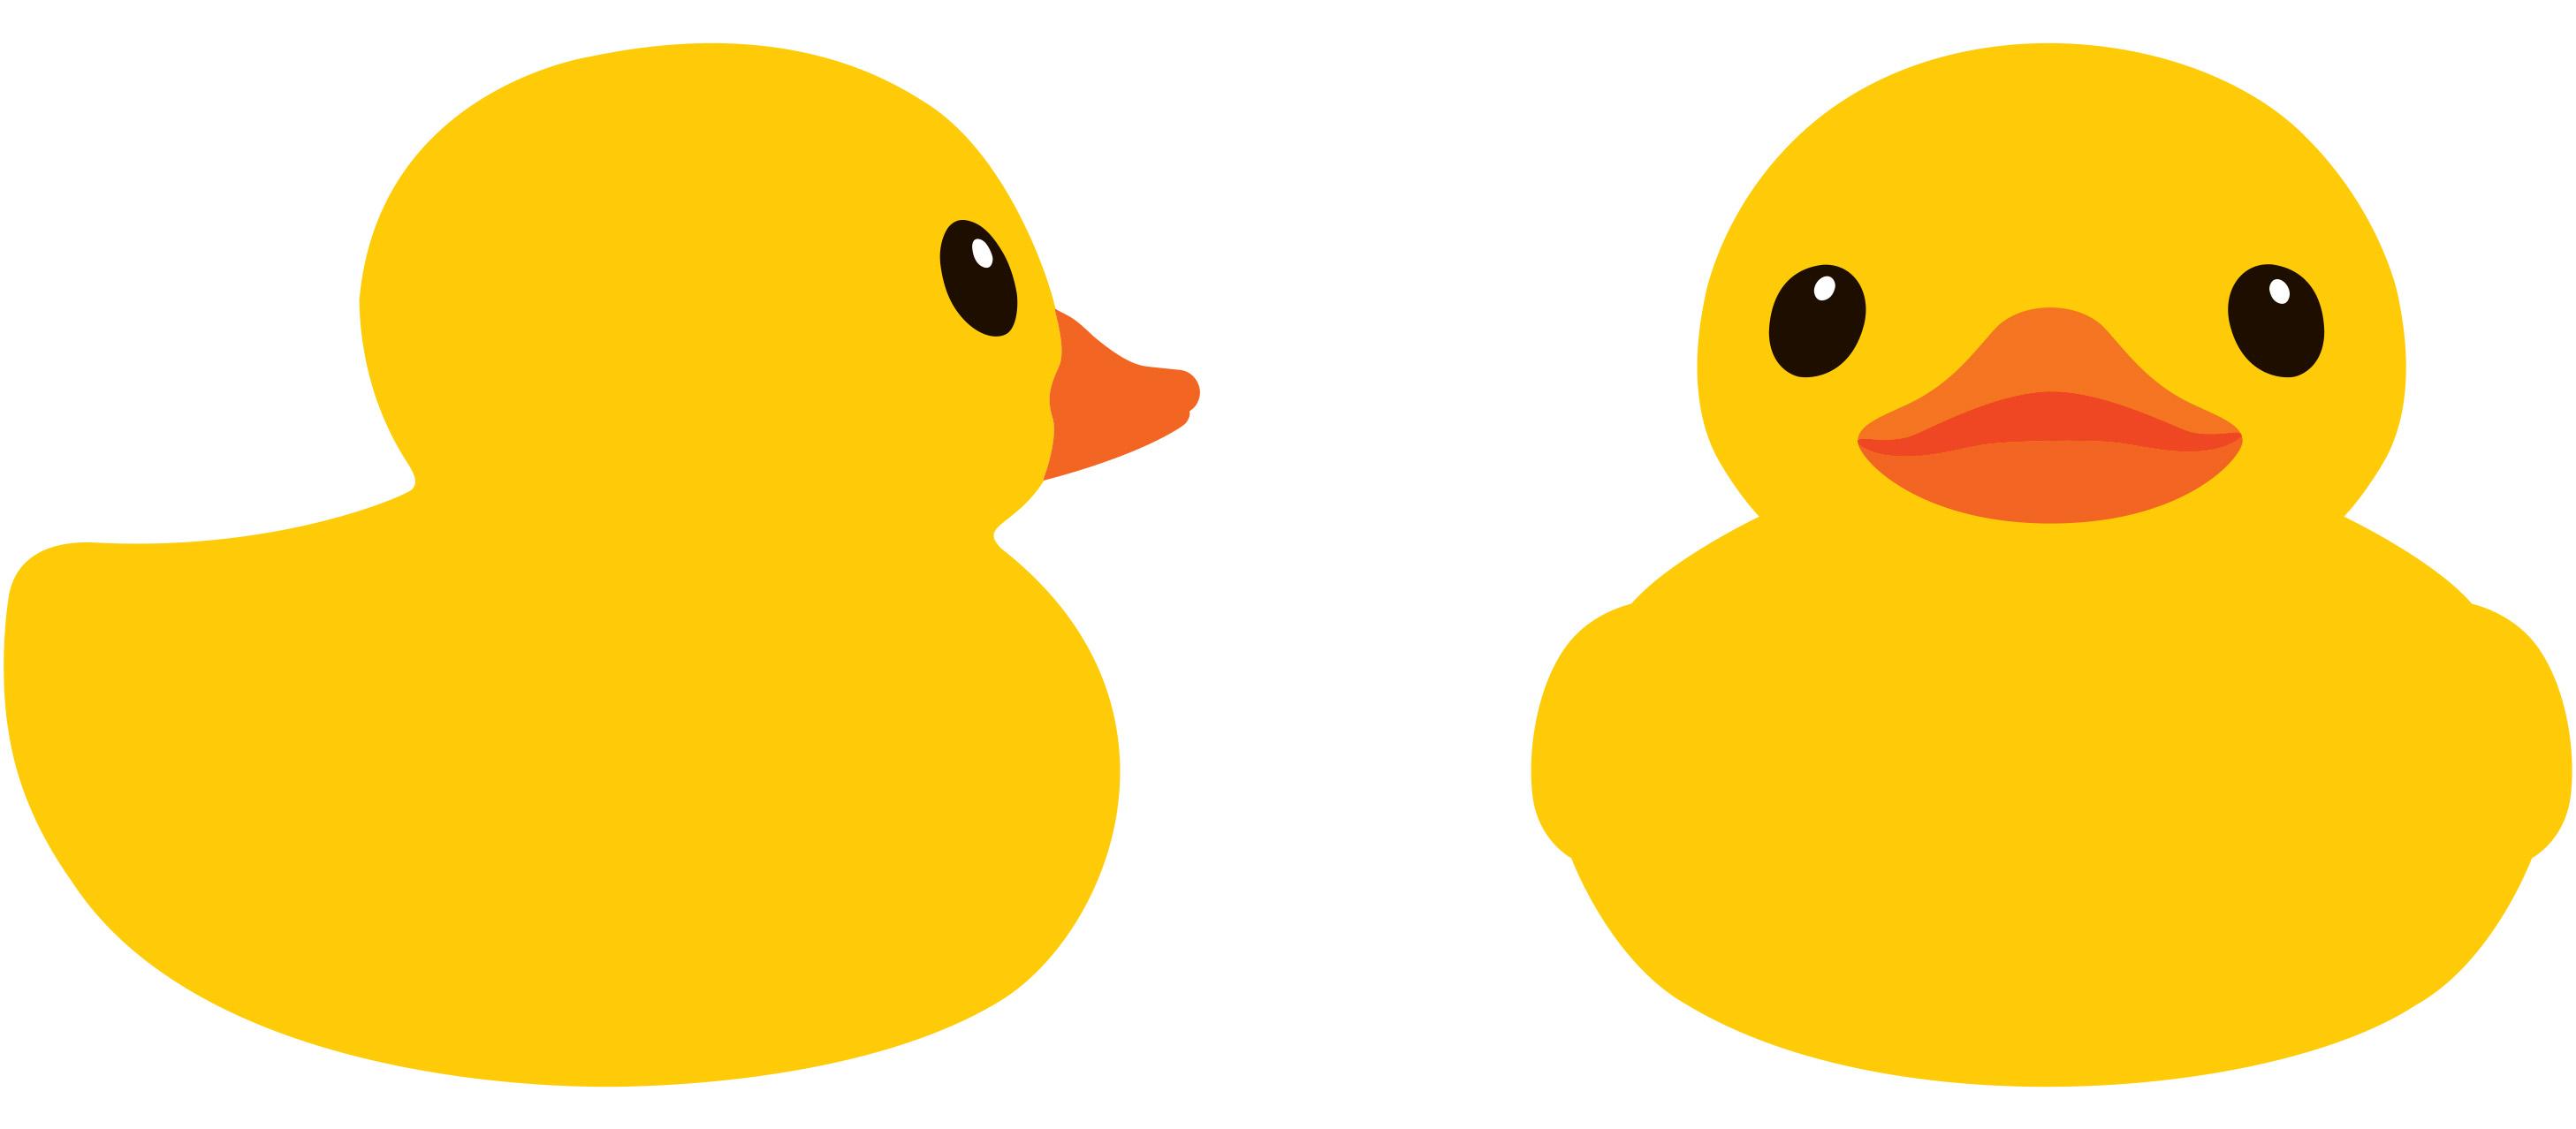 2915x1278 Rubber Duck